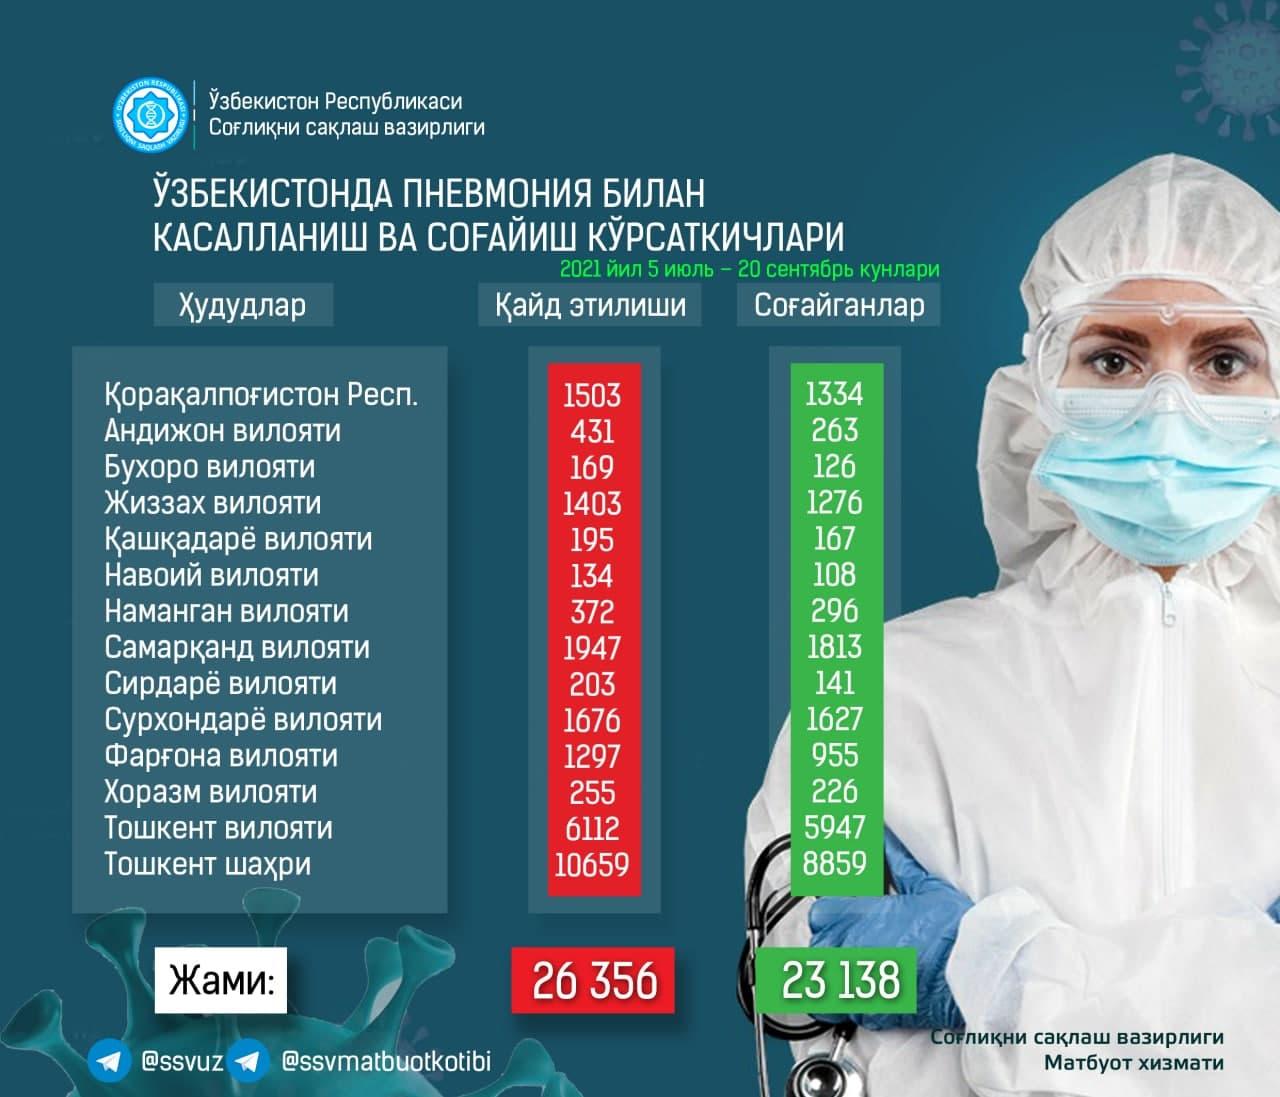 За сутки более 80 человек заболели пневмонией — статистика